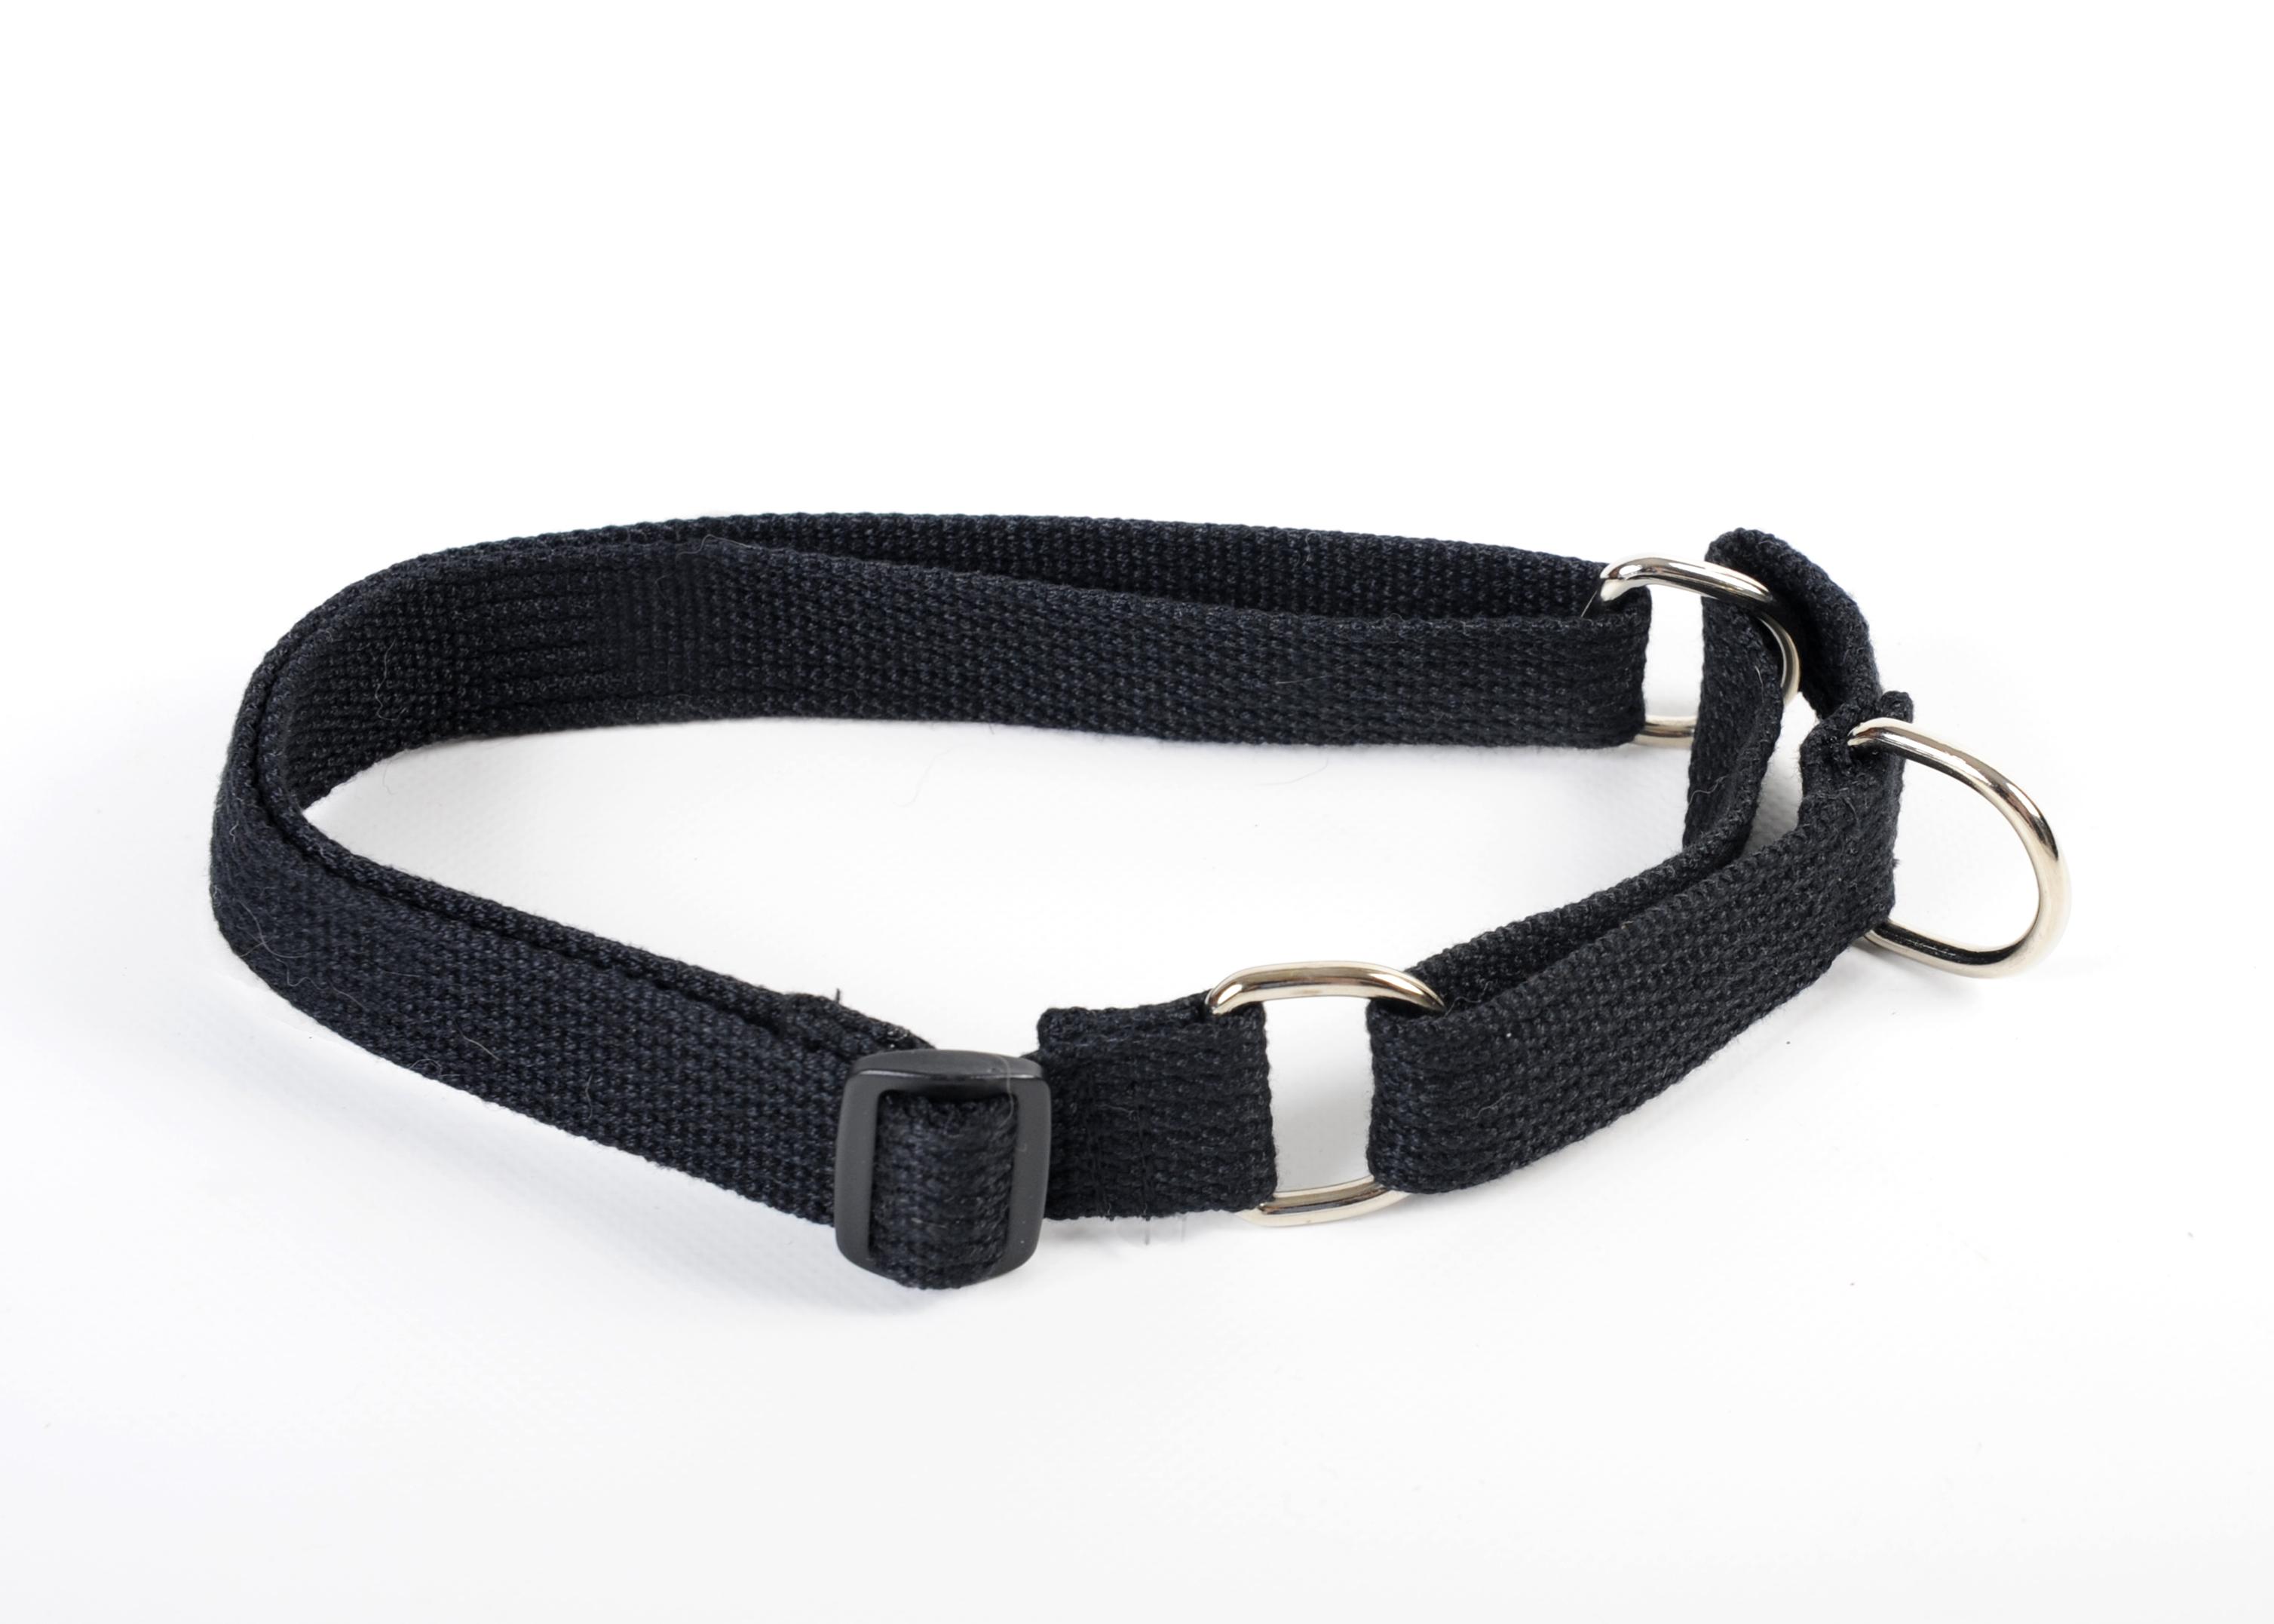 Limited Slip Dog Collar